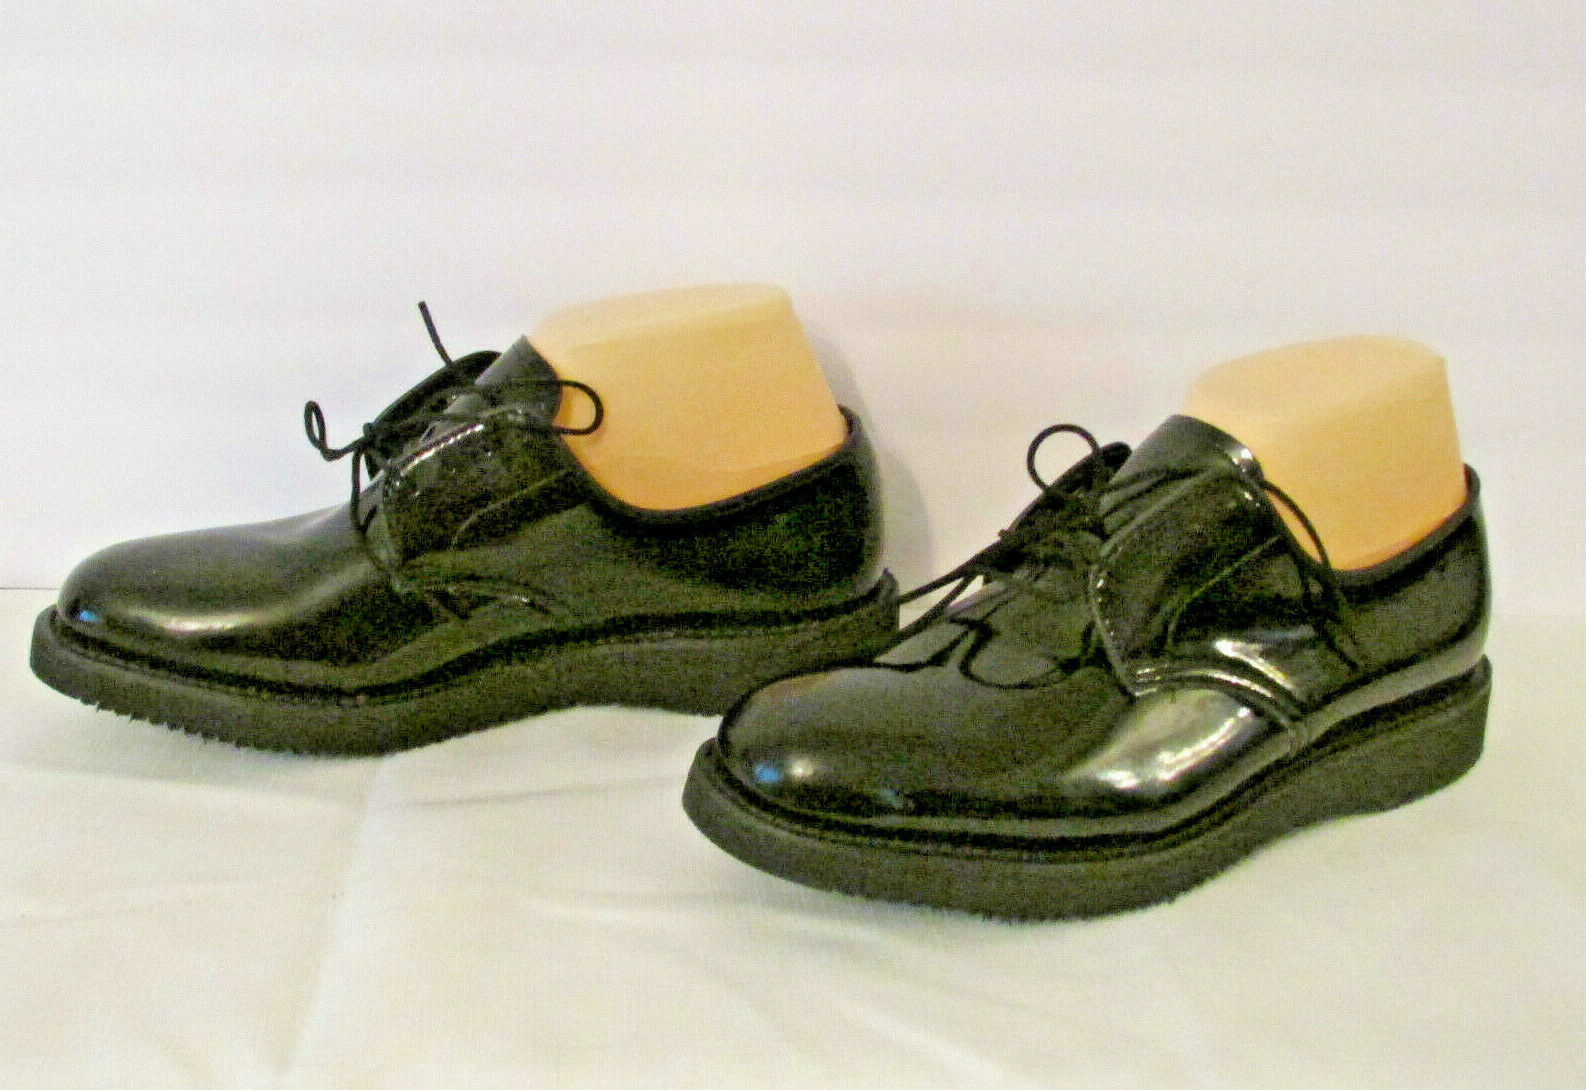 Lady Thorogood Black Patent Uniform Shoes 7.5 Woman's Oxfords Postal Vibram Sole